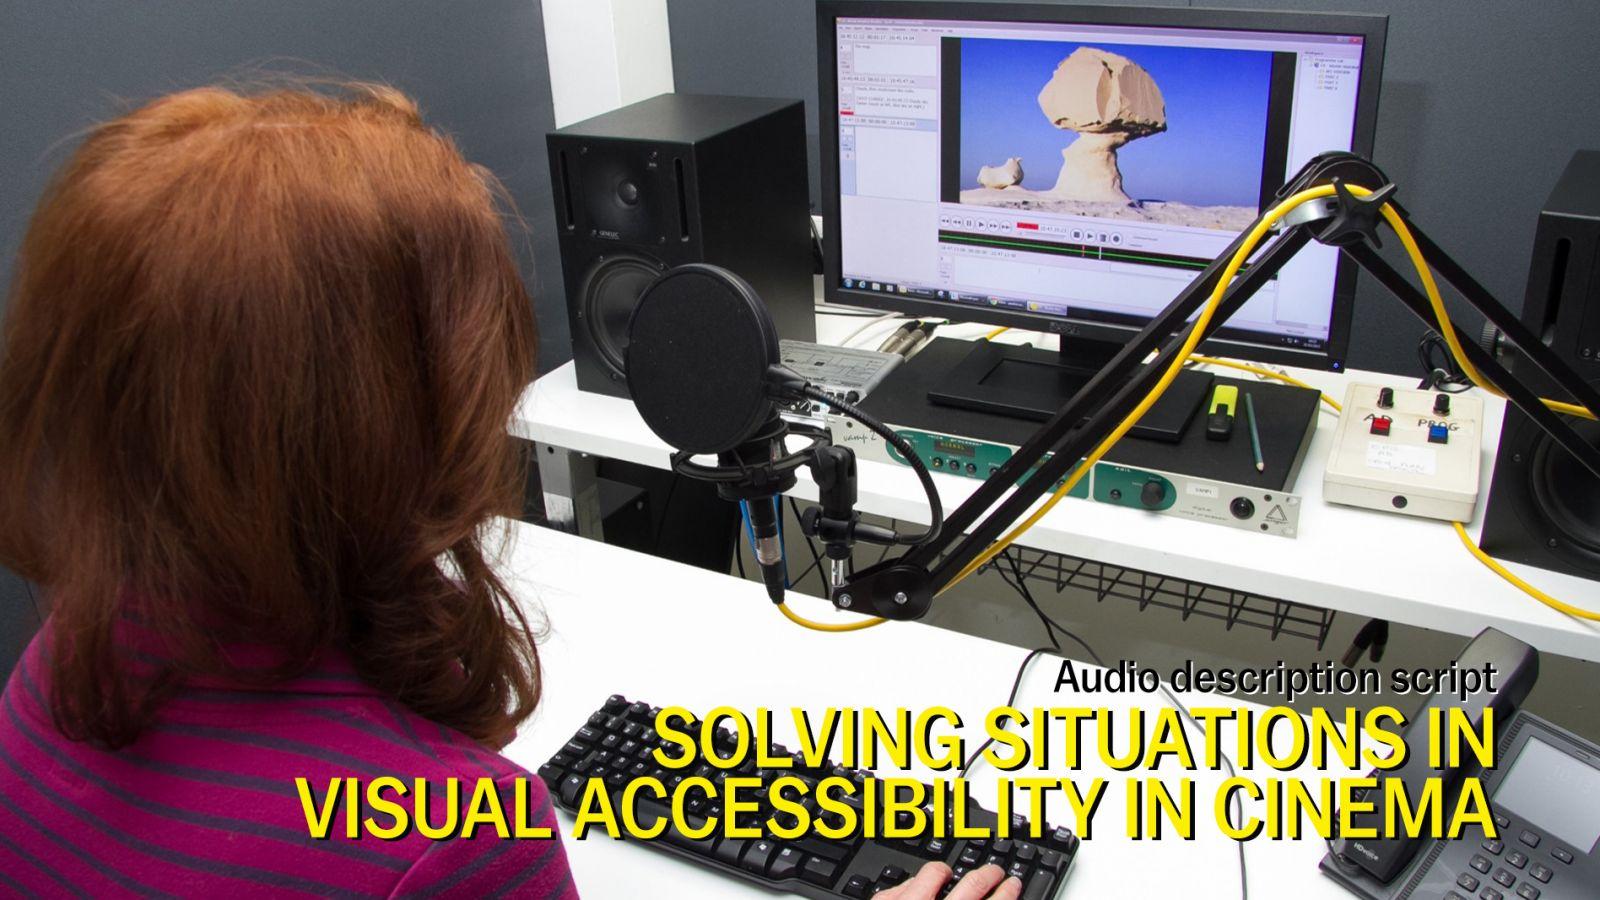 Audio description script. Solving situations in visual accessibility in cinema